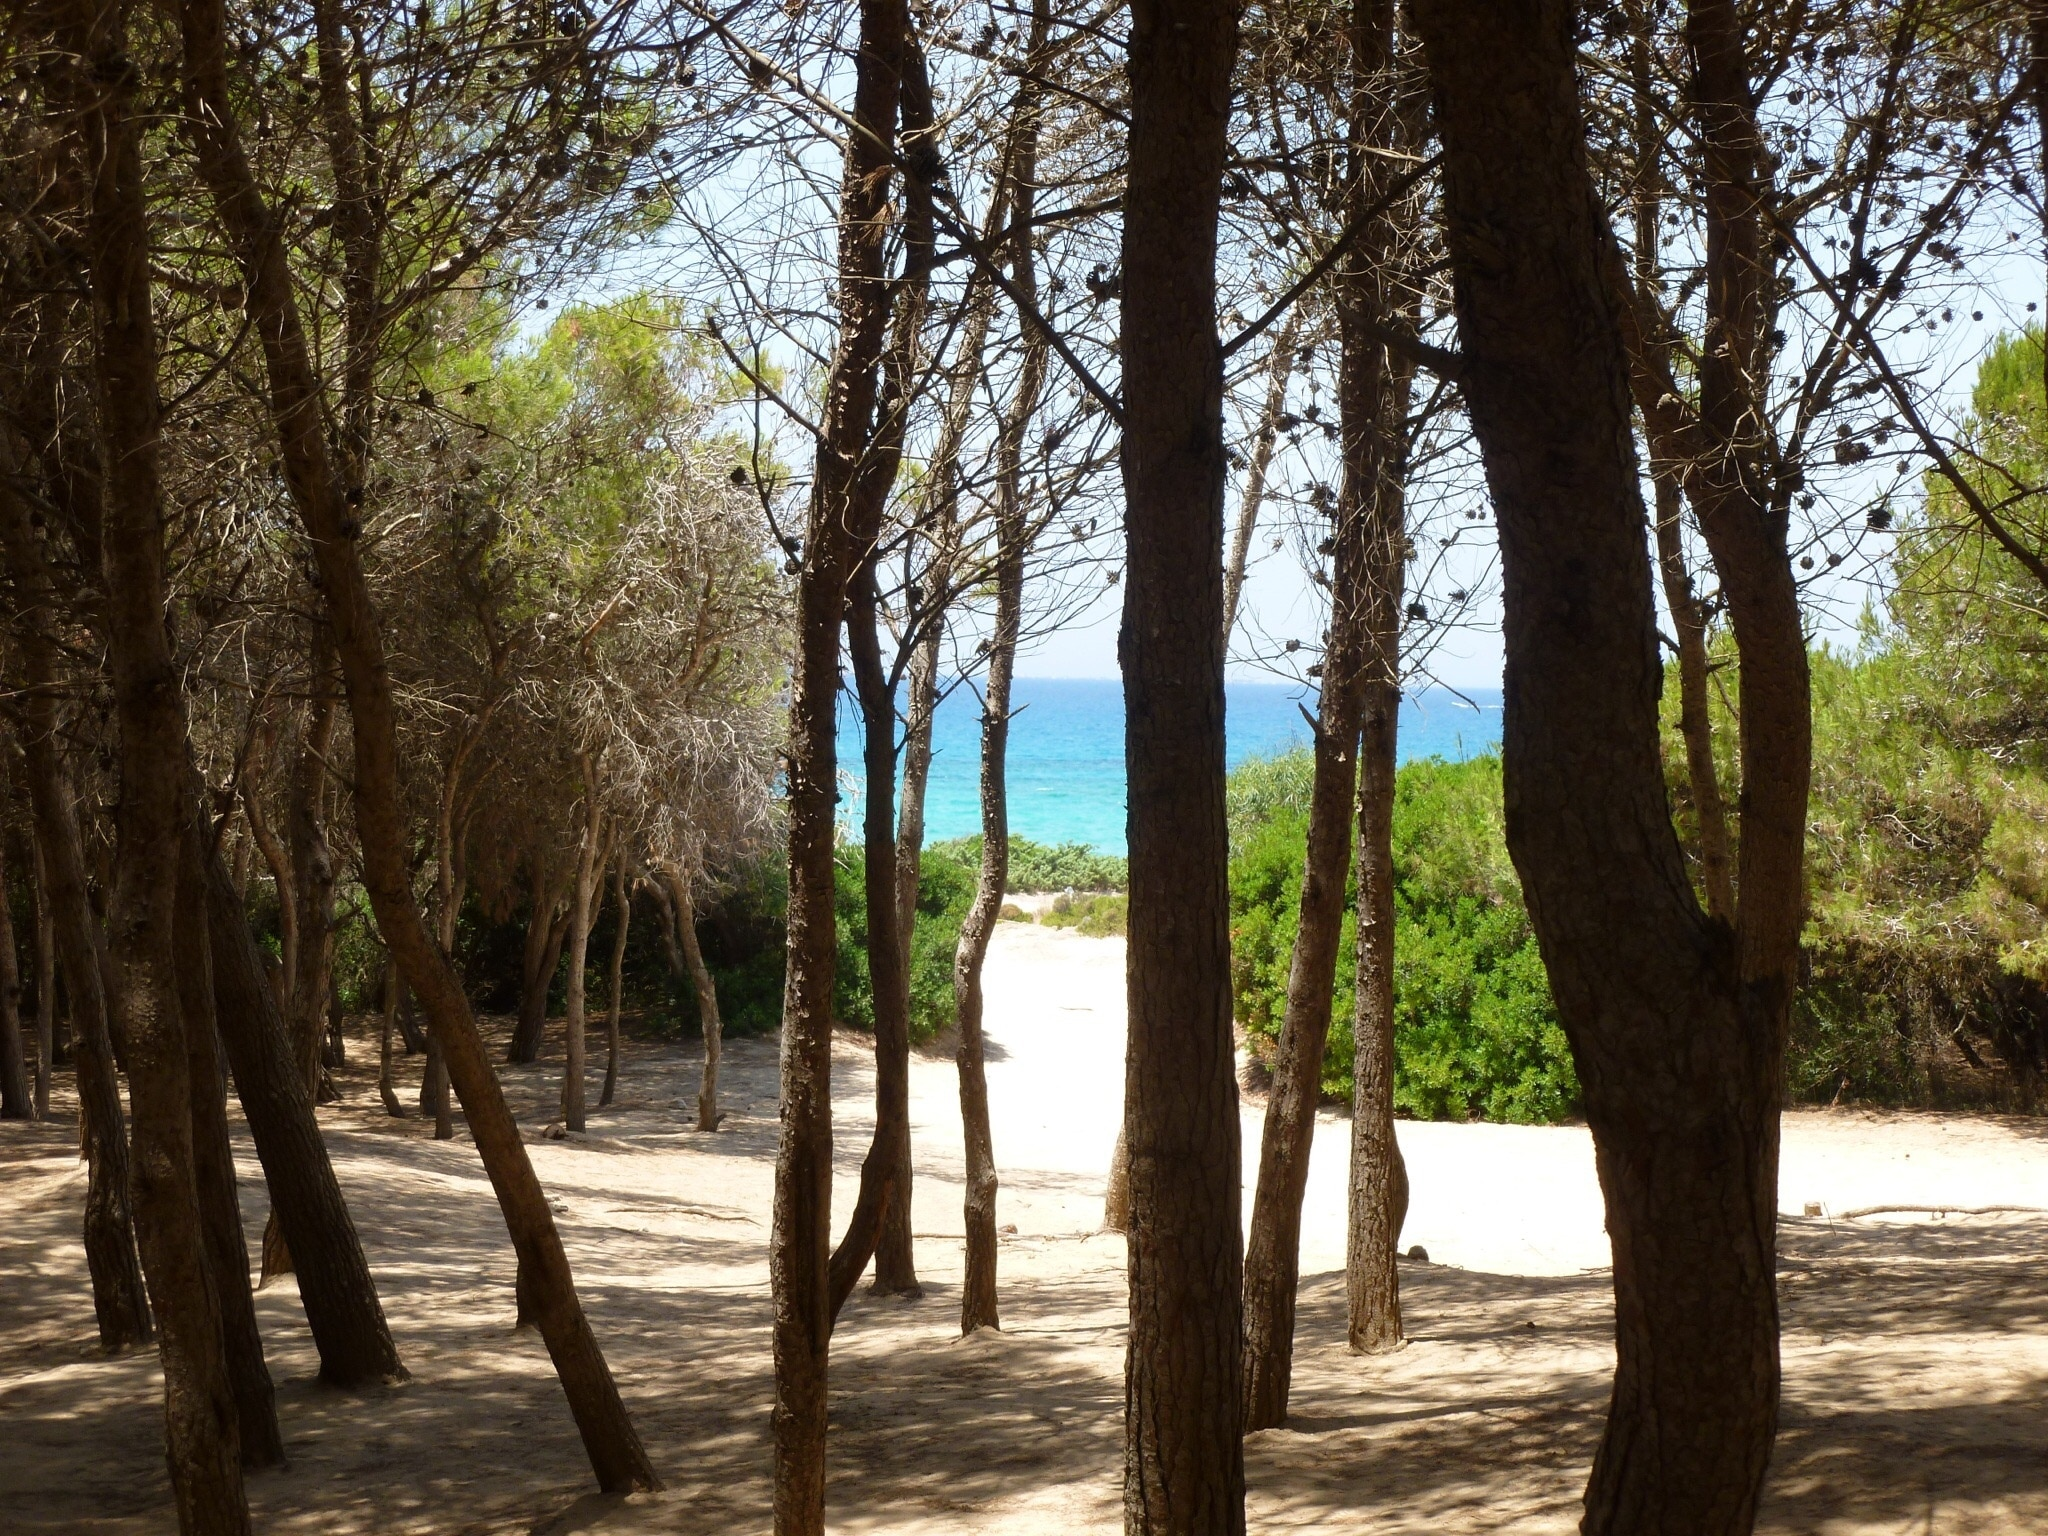 Lido Punta della Suina, Gallipoli, Apulië, Italië